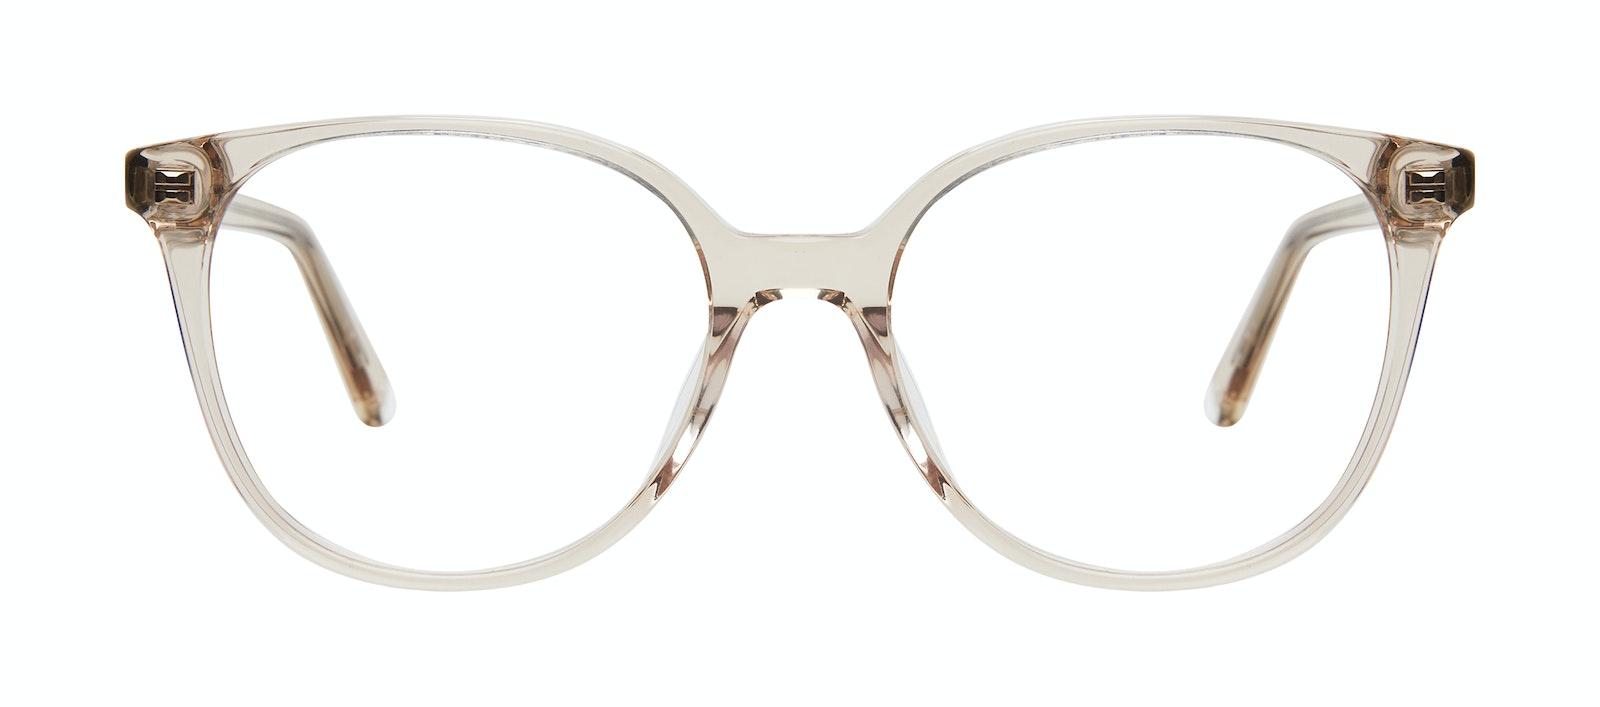 Affordable Fashion Glasses Square Eyeglasses Women Novel Blond Front